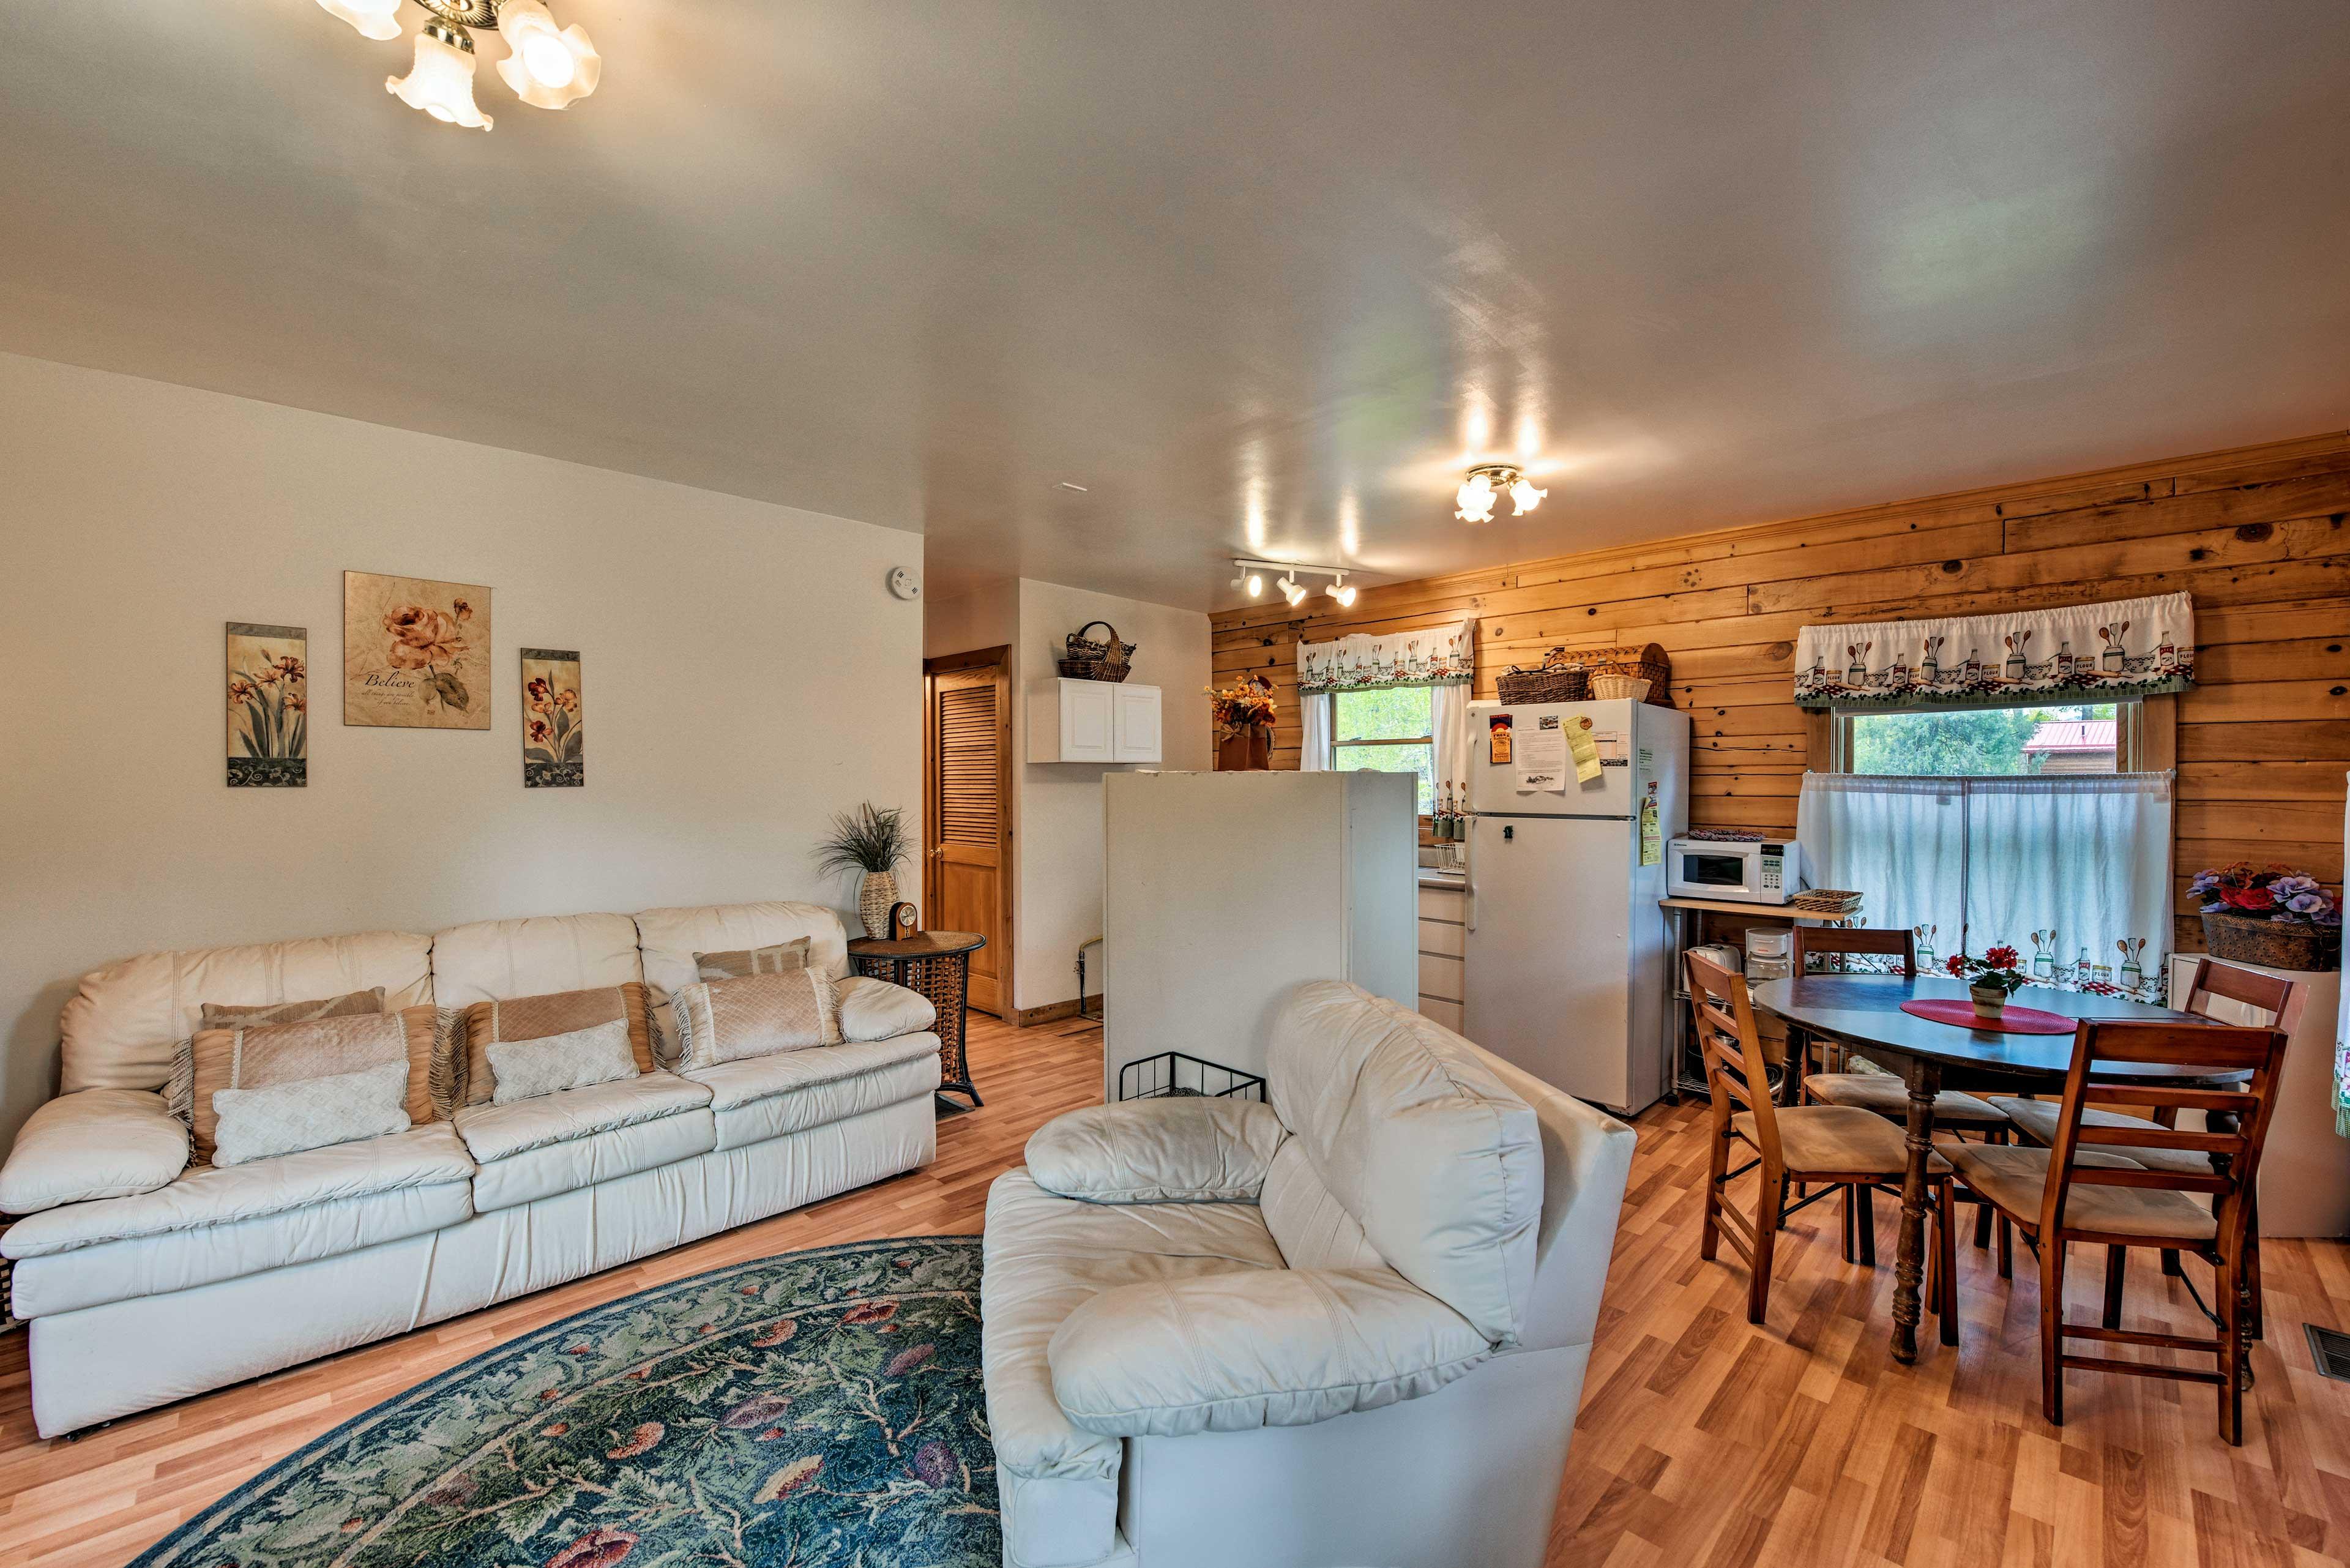 The cabin boasts hardwood floors and rustic decor.